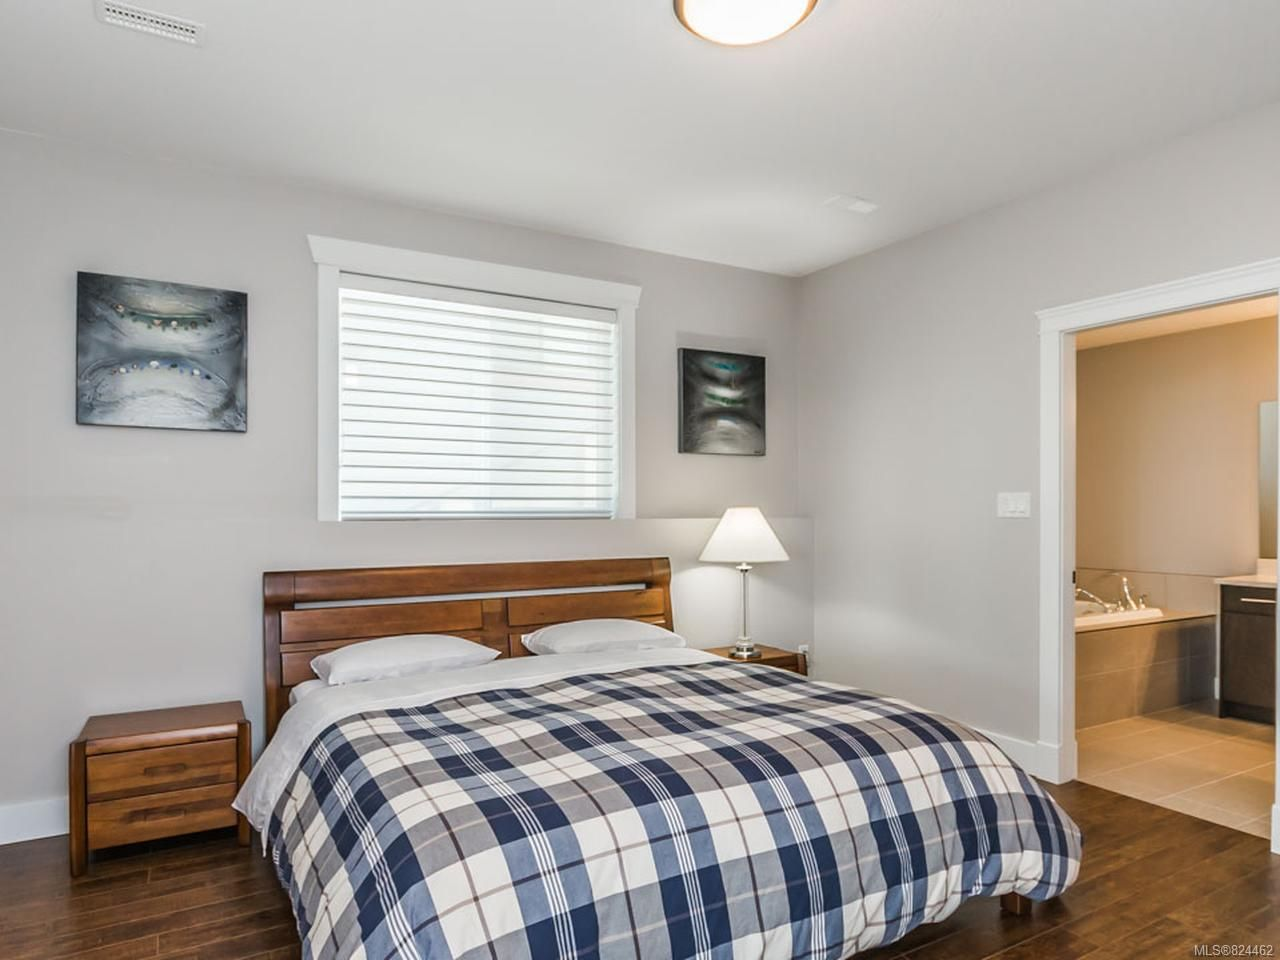 Photo 29: Photos: 3864 Gulfview Dr in NANAIMO: Na North Nanaimo House for sale (Nanaimo)  : MLS®# 824462